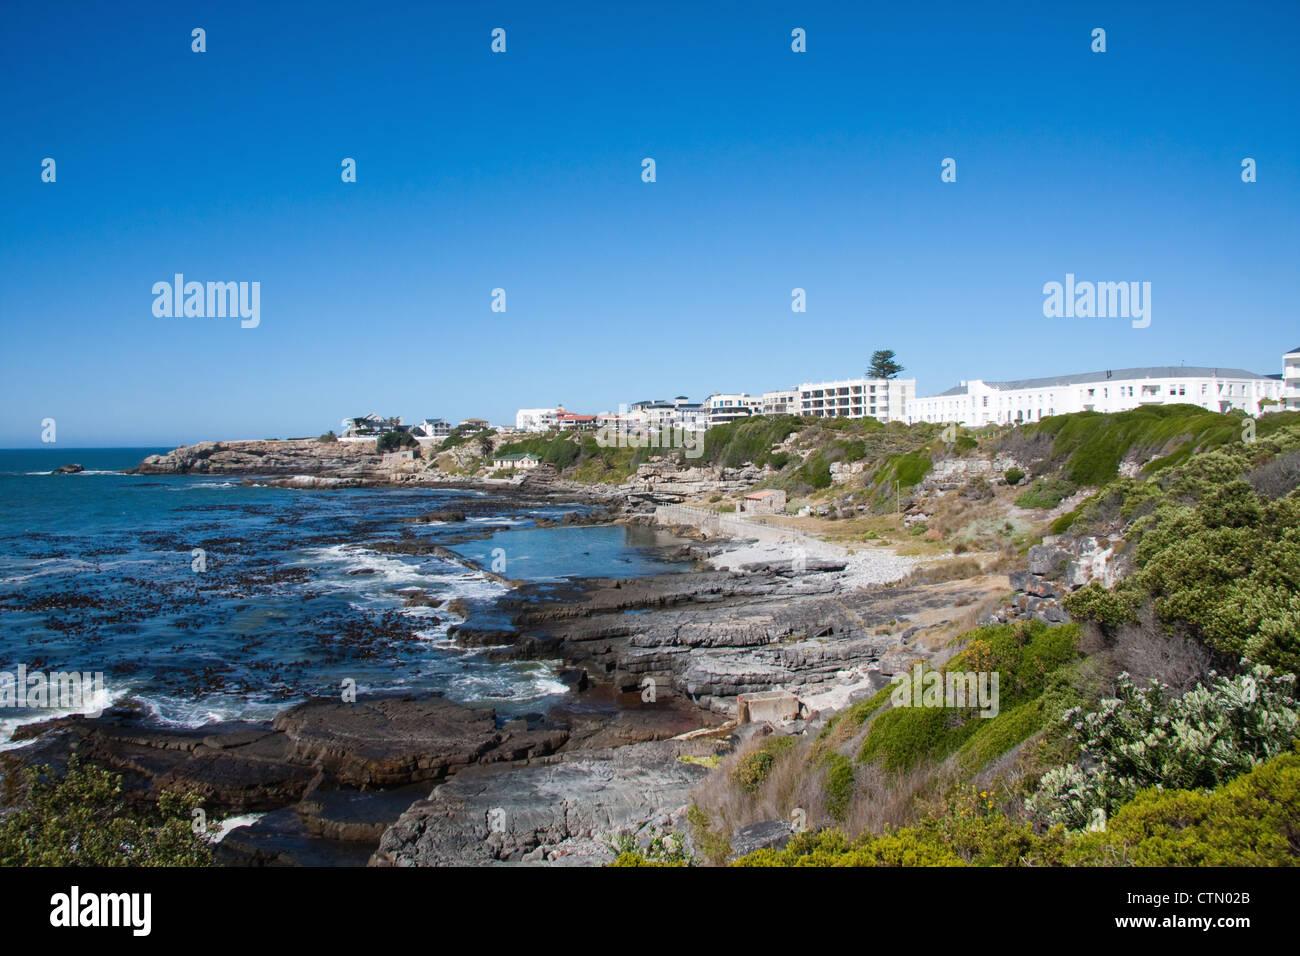 The Marine Tidal Swimming Pool Lies Between Rocks In The Sea Below Stock Photo Royalty Free